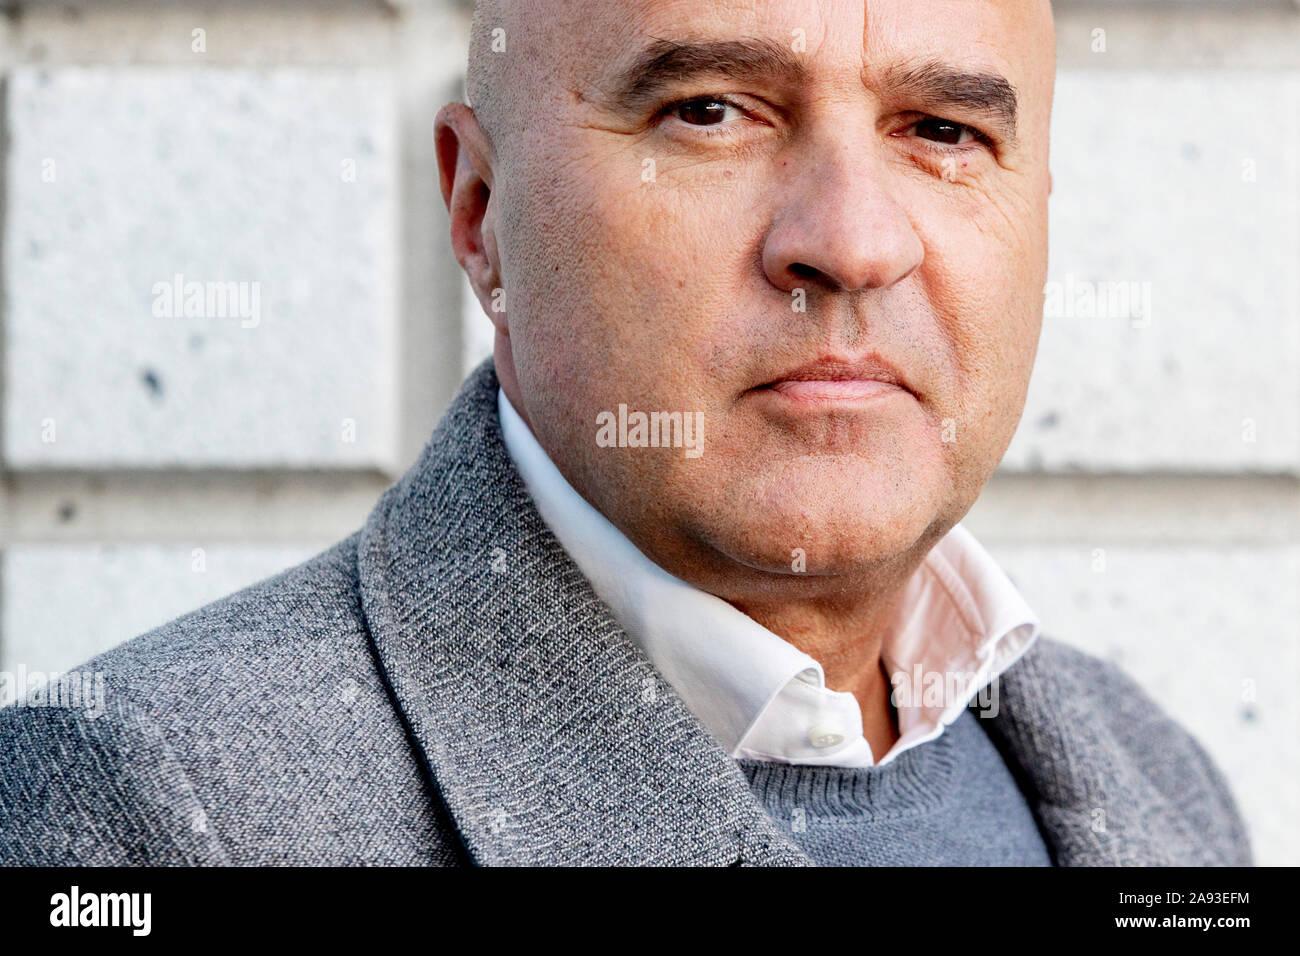 Amsterdam 12 11 2019 Portrait Of Crime Reporter John Van Den Heuvel Stock Photo Alamy